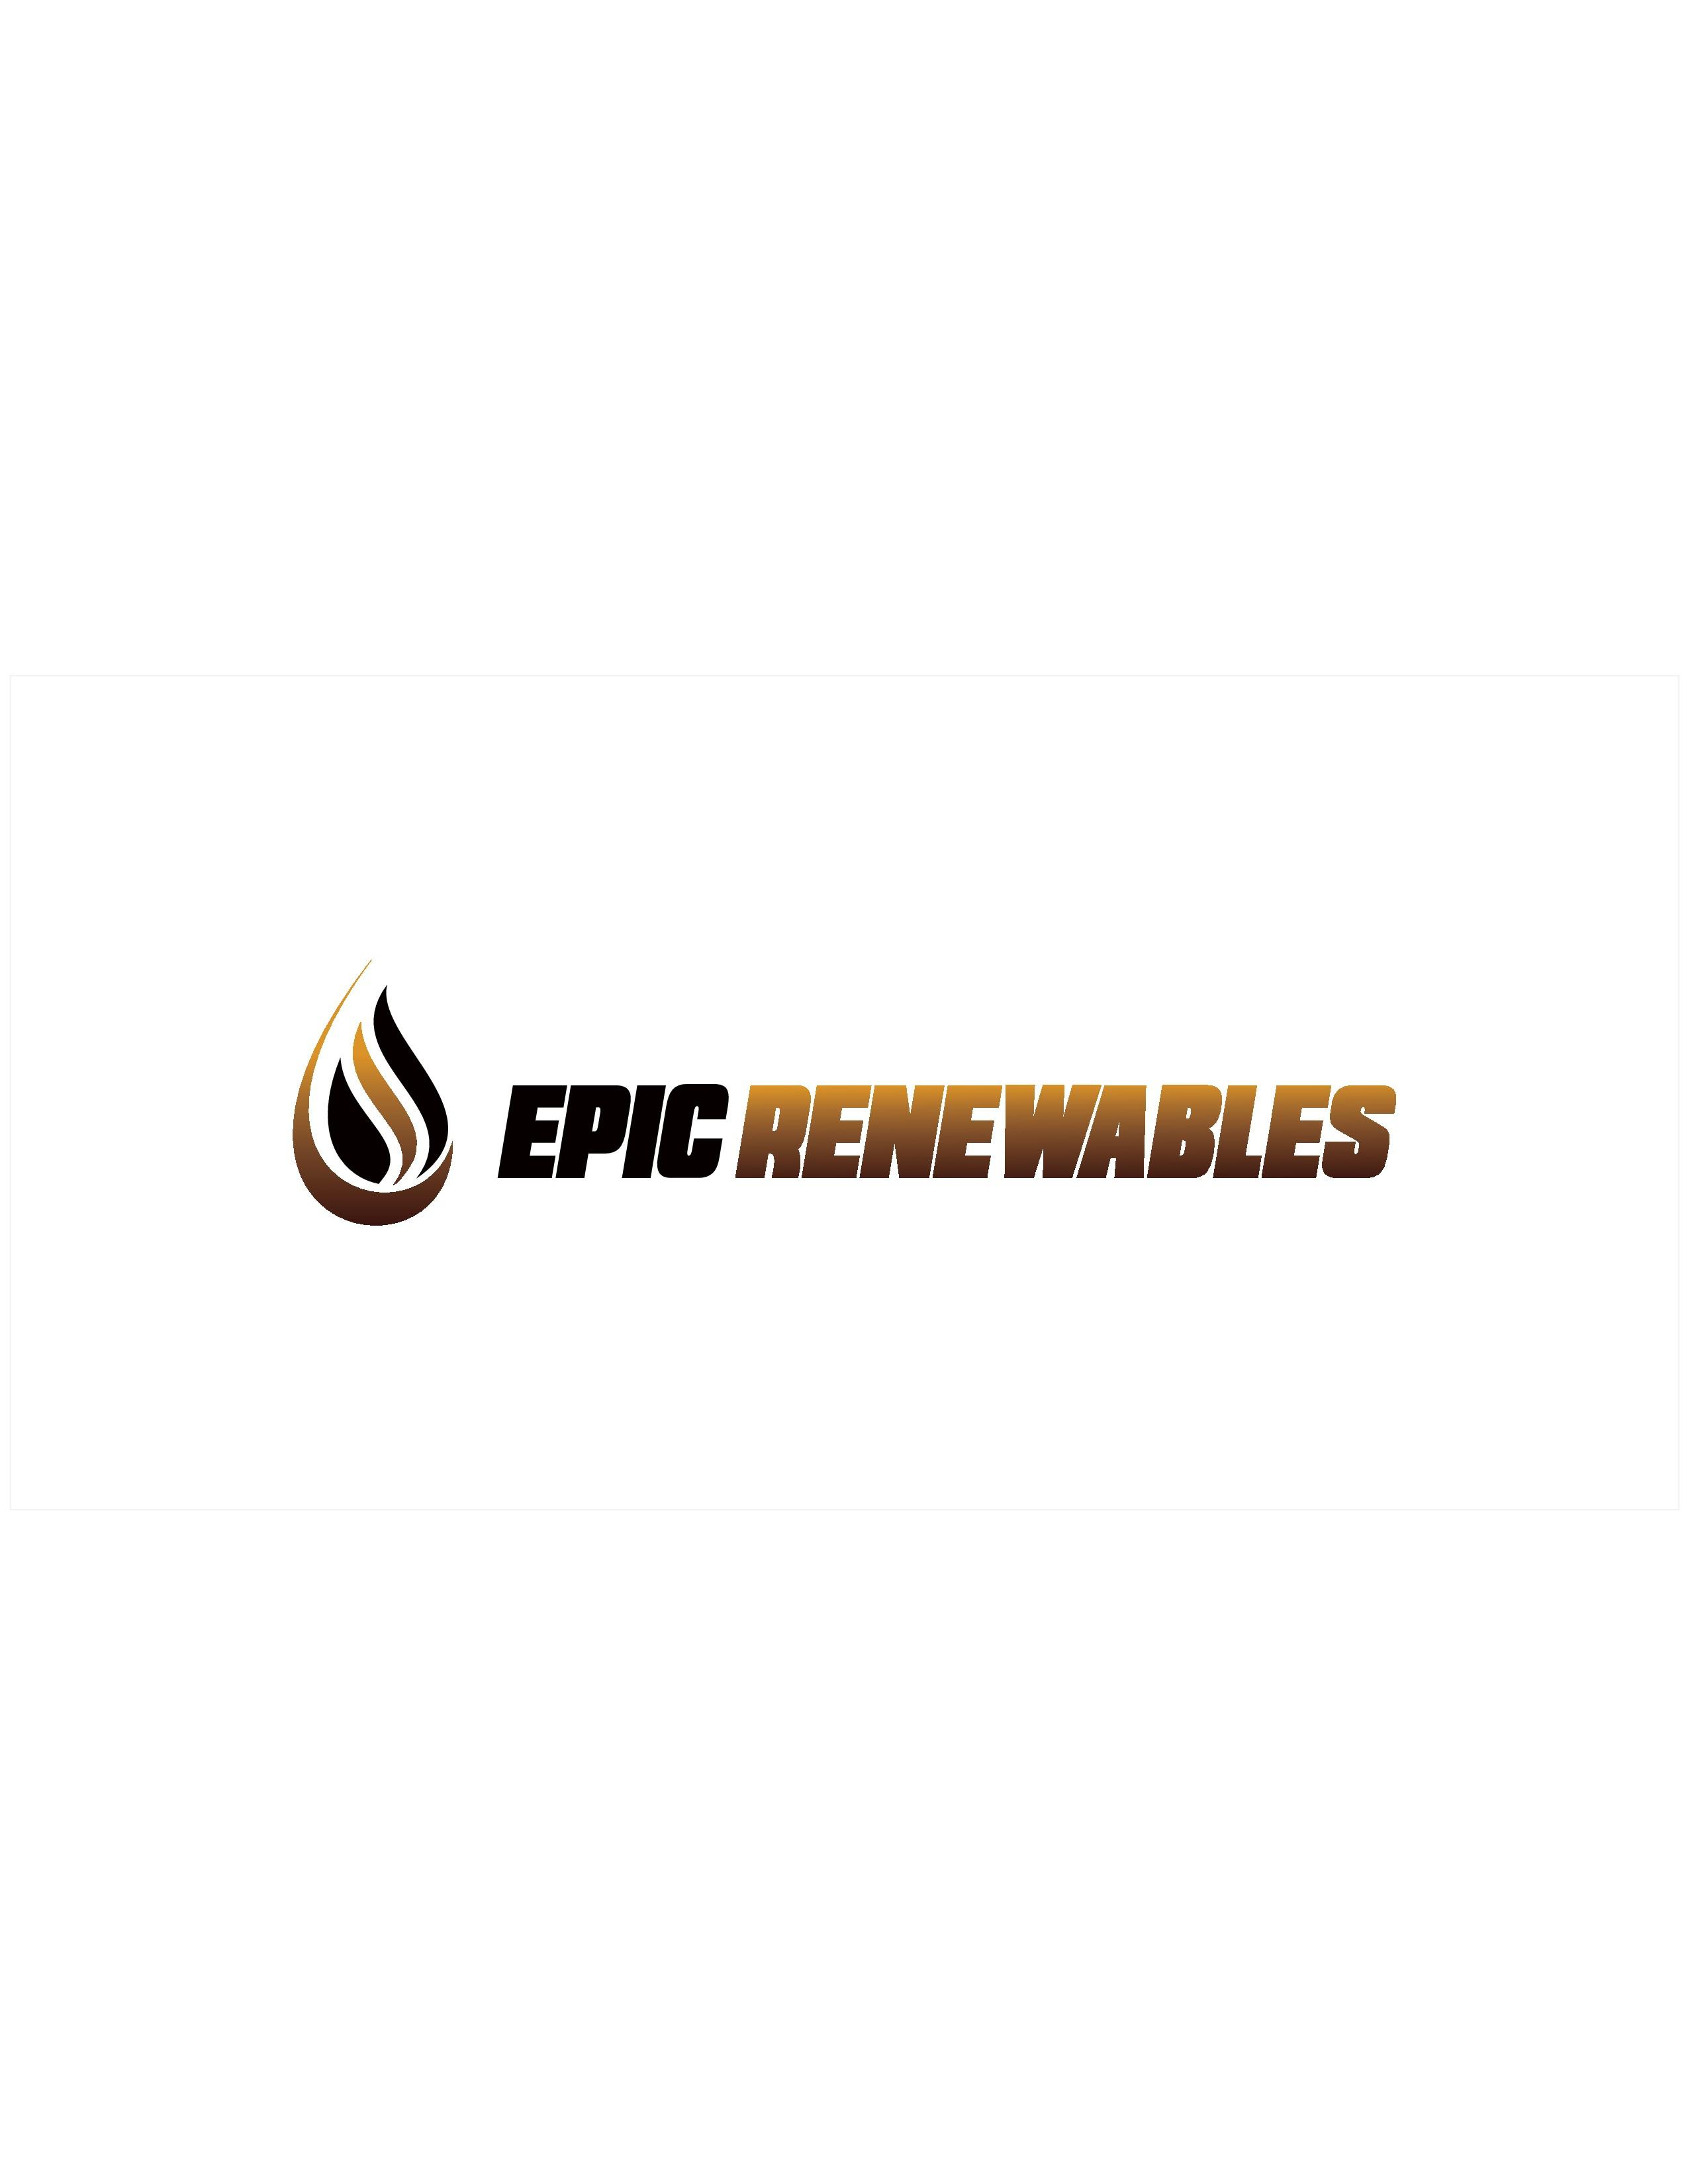 Epic Renewables LOGO Design